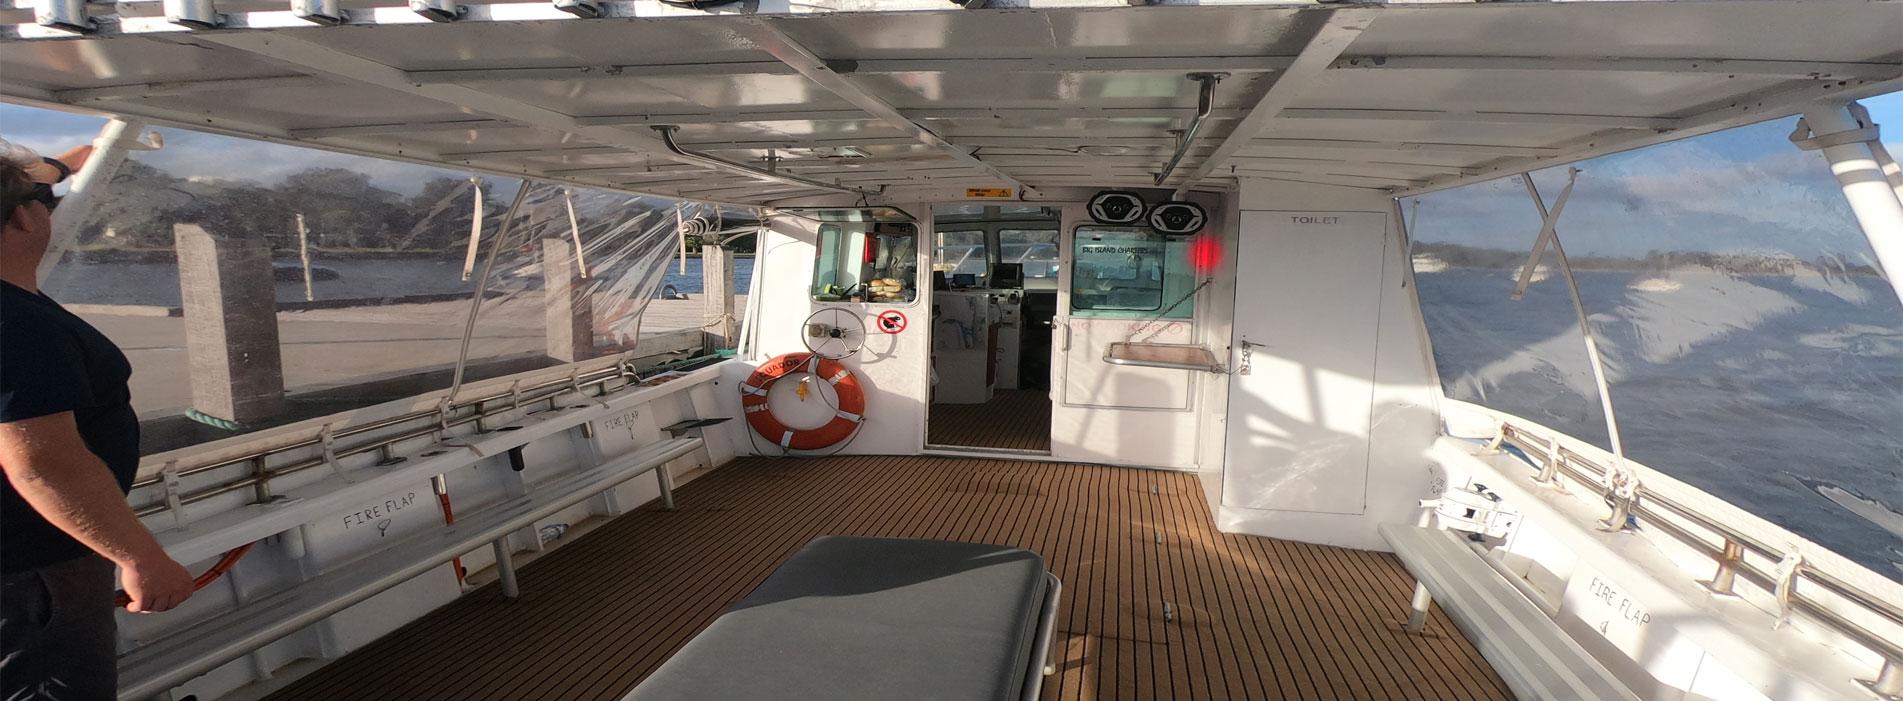 EQUADOR-boat-charters-perth-wa-deck-to-cabin-view